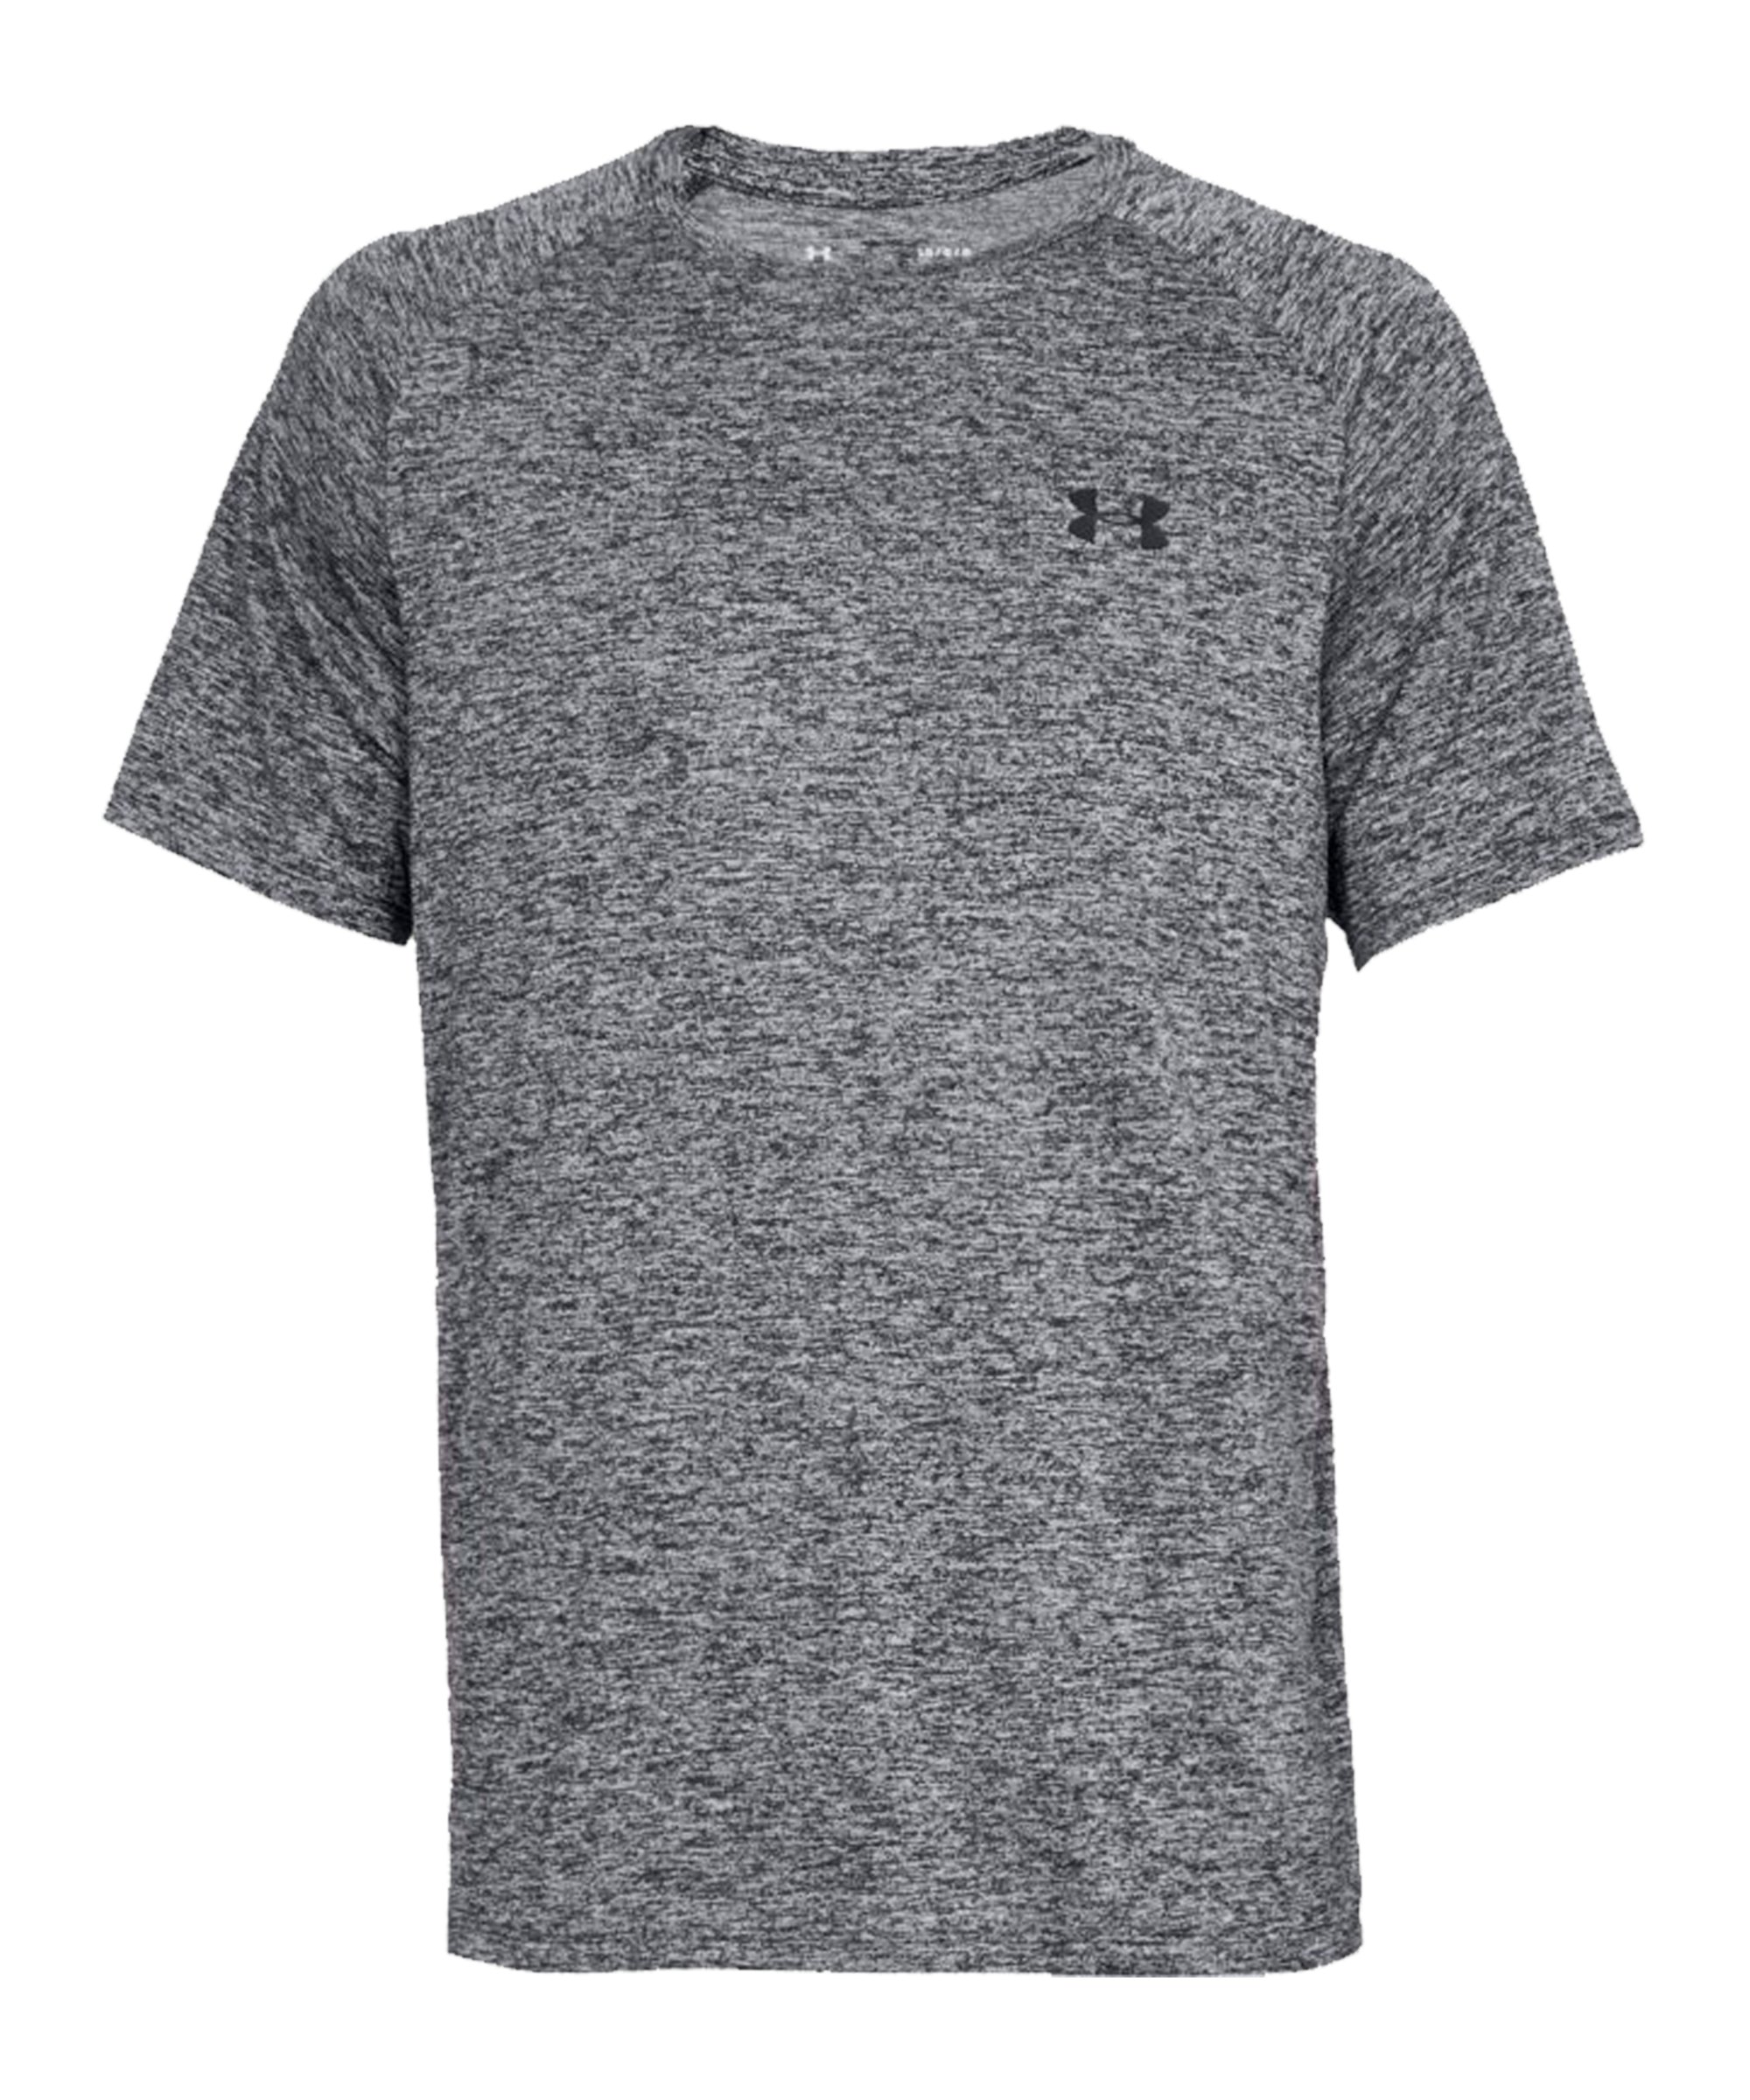 Under Armour Tech 2.0 T-Shirt Grau F002 - grau